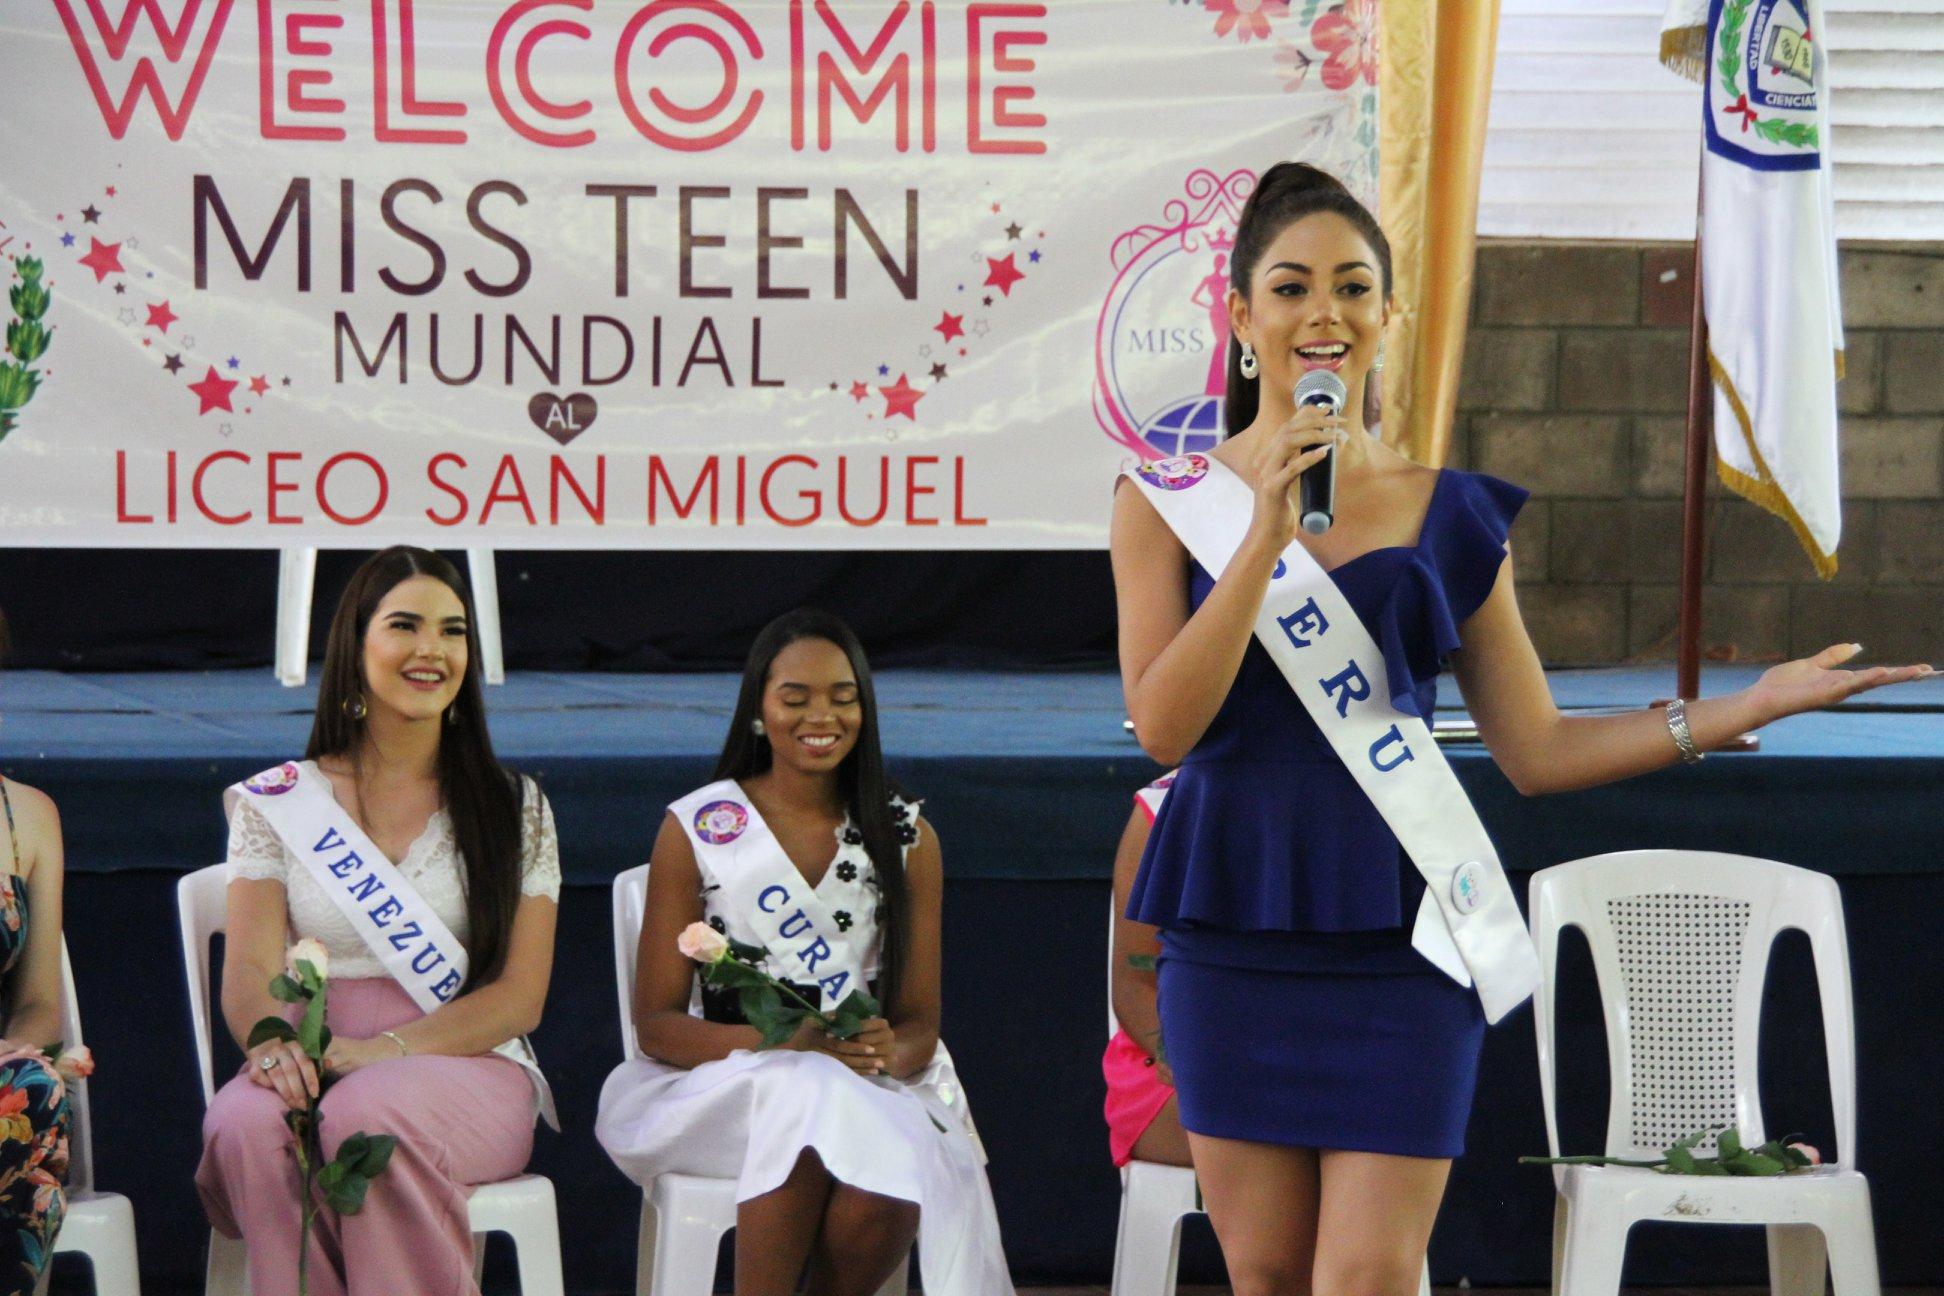 romina lopez, top 12 de miss teen mundial 2019. - Página 4 60925610